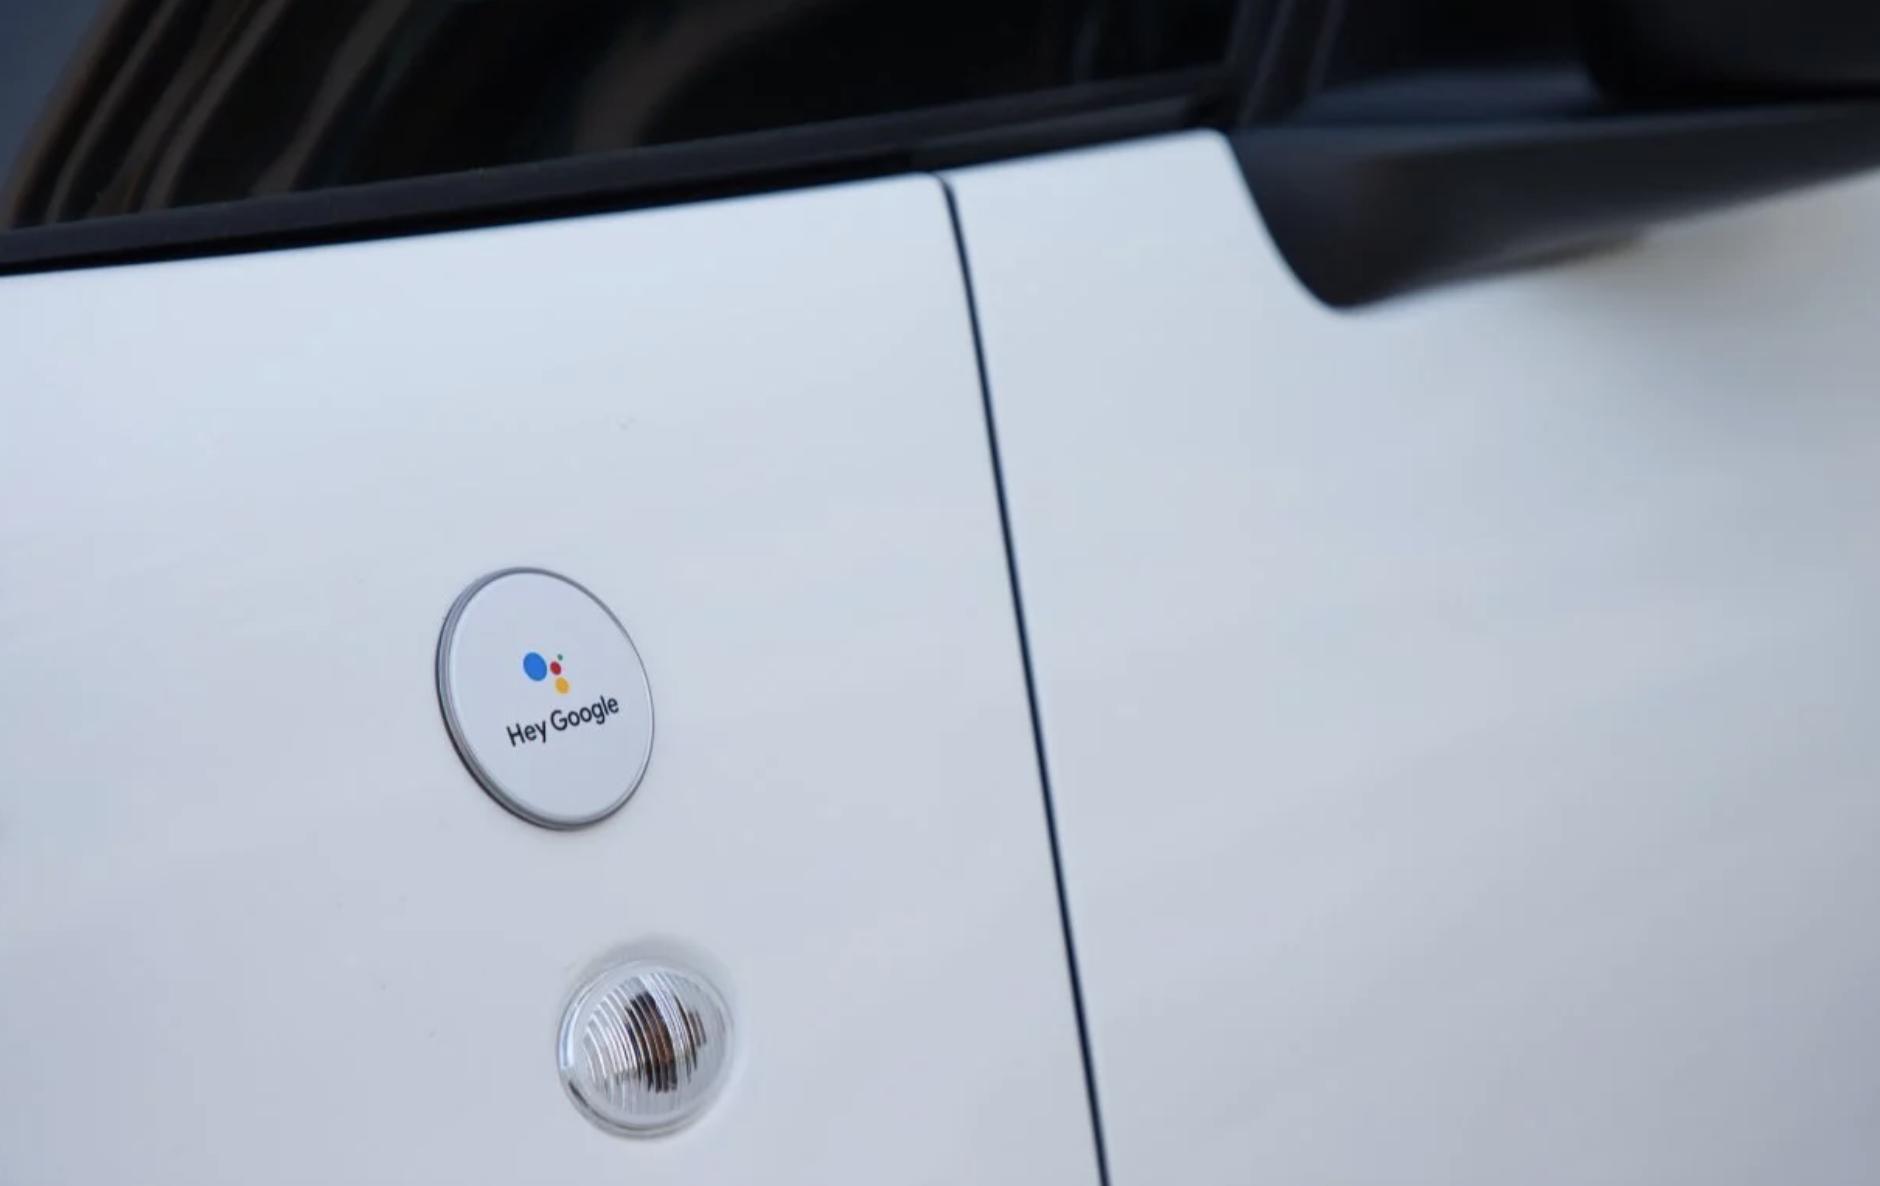 Hey google cars by Fiat